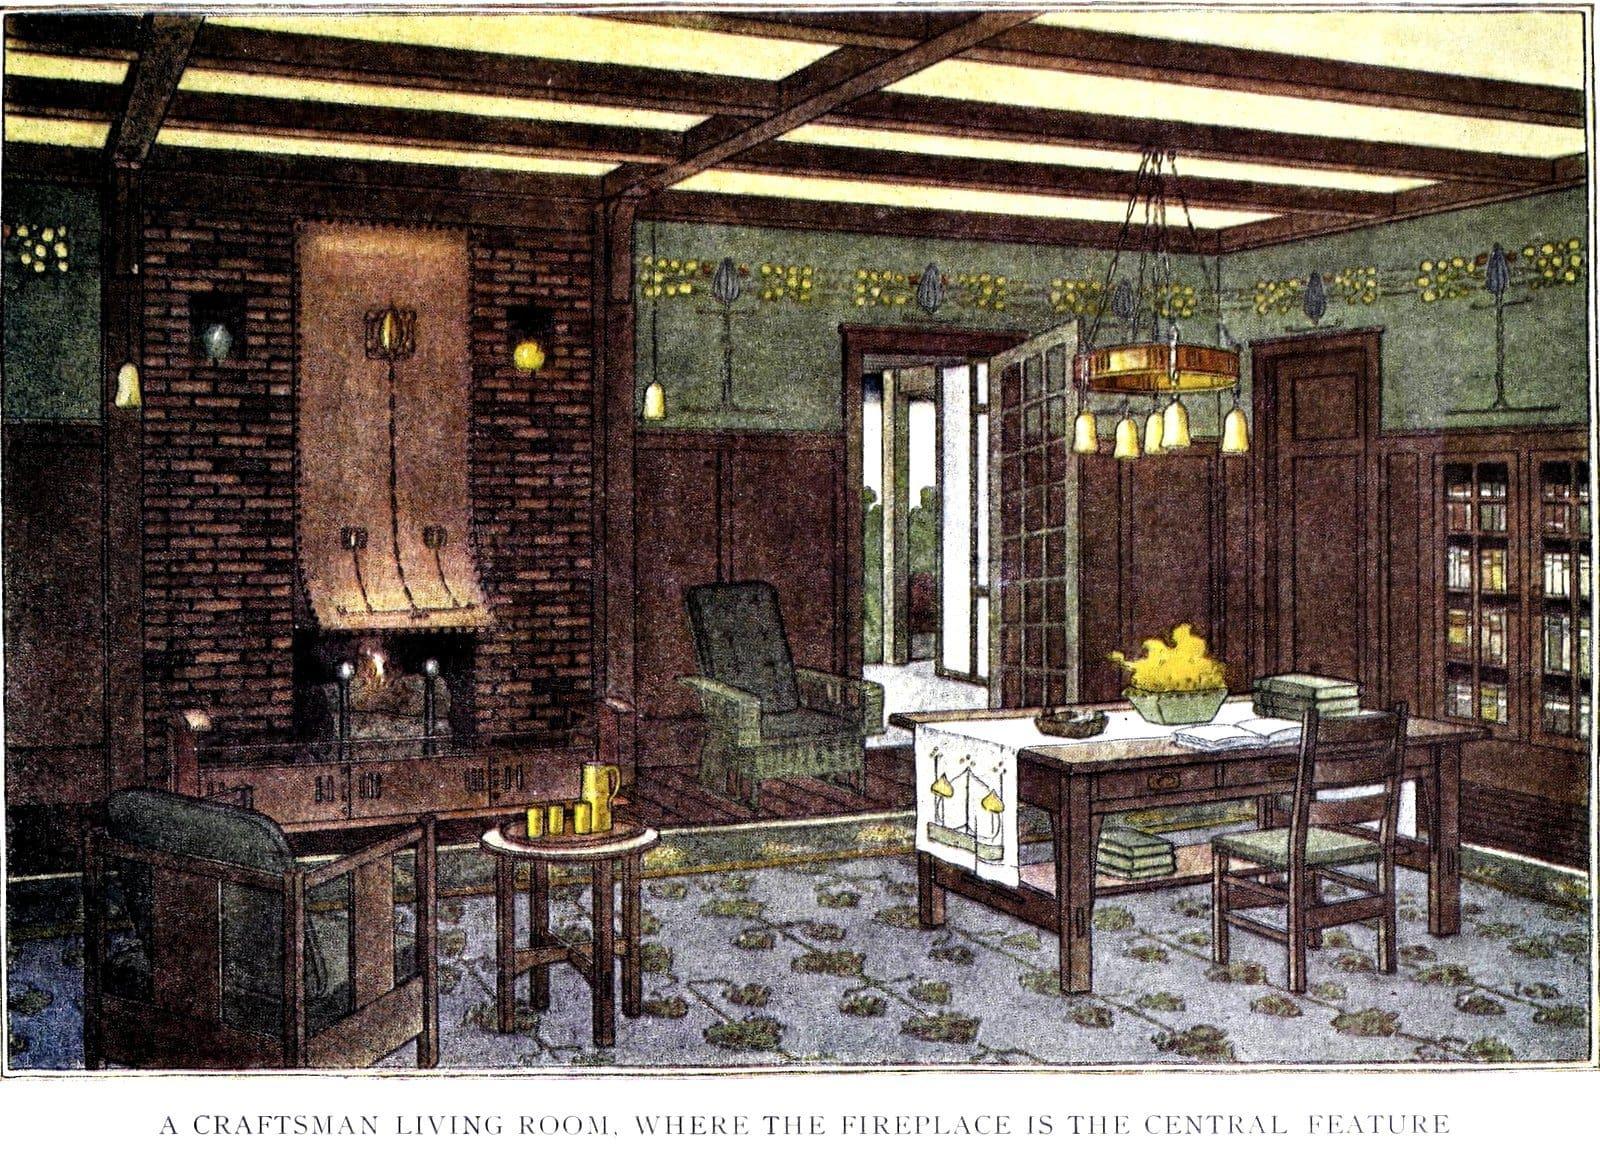 A vintage Craftsman home interior - Living room decor (1910s)